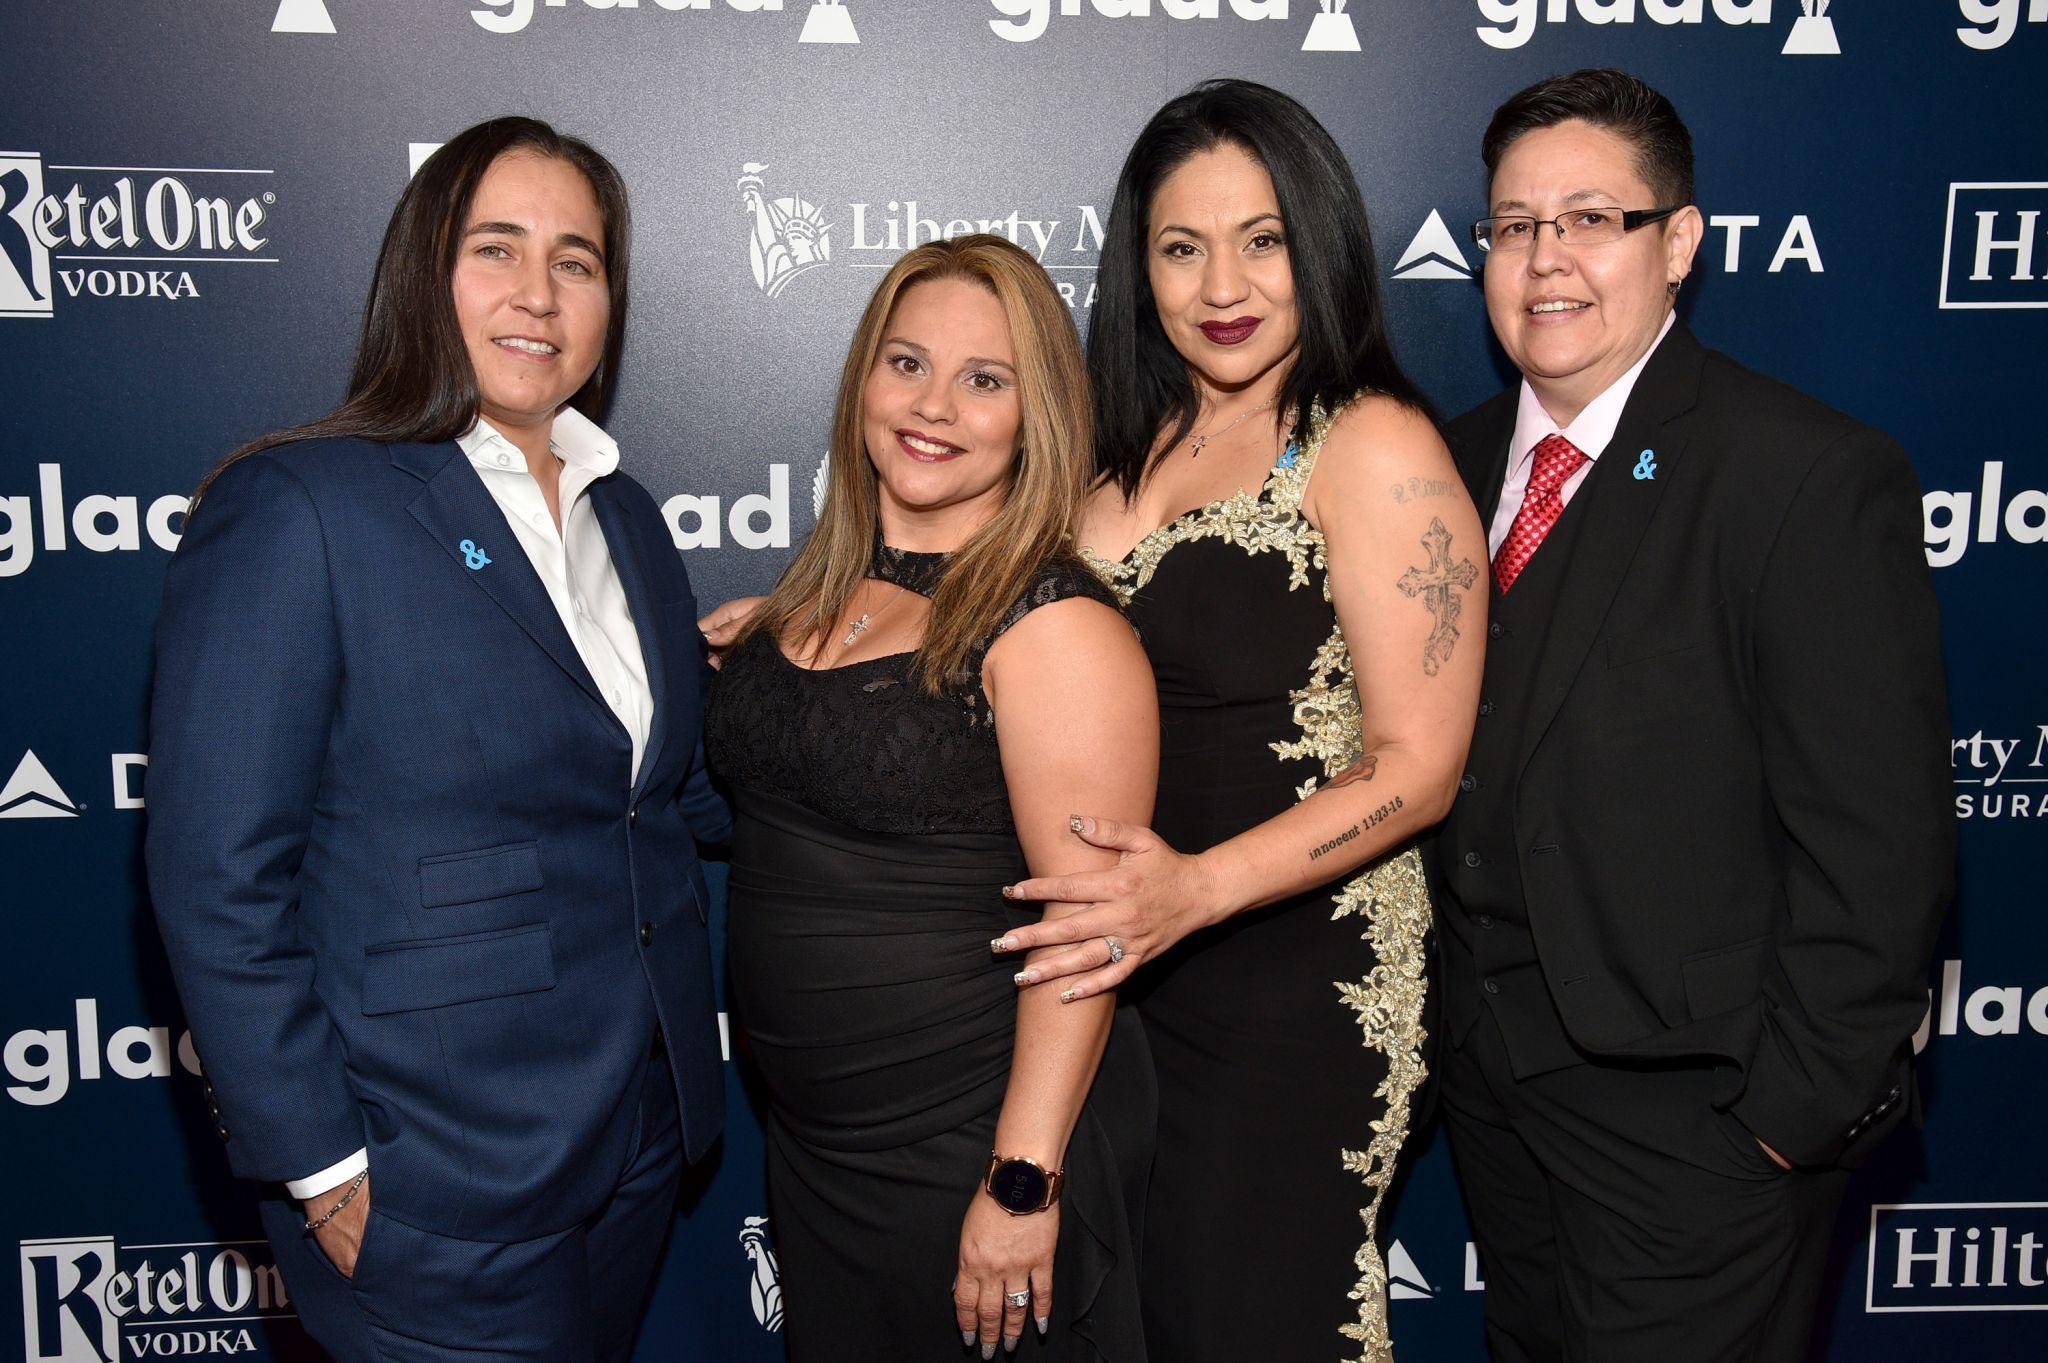 Hollywood Stars Cheer As San Antonio Four Accept Big Award